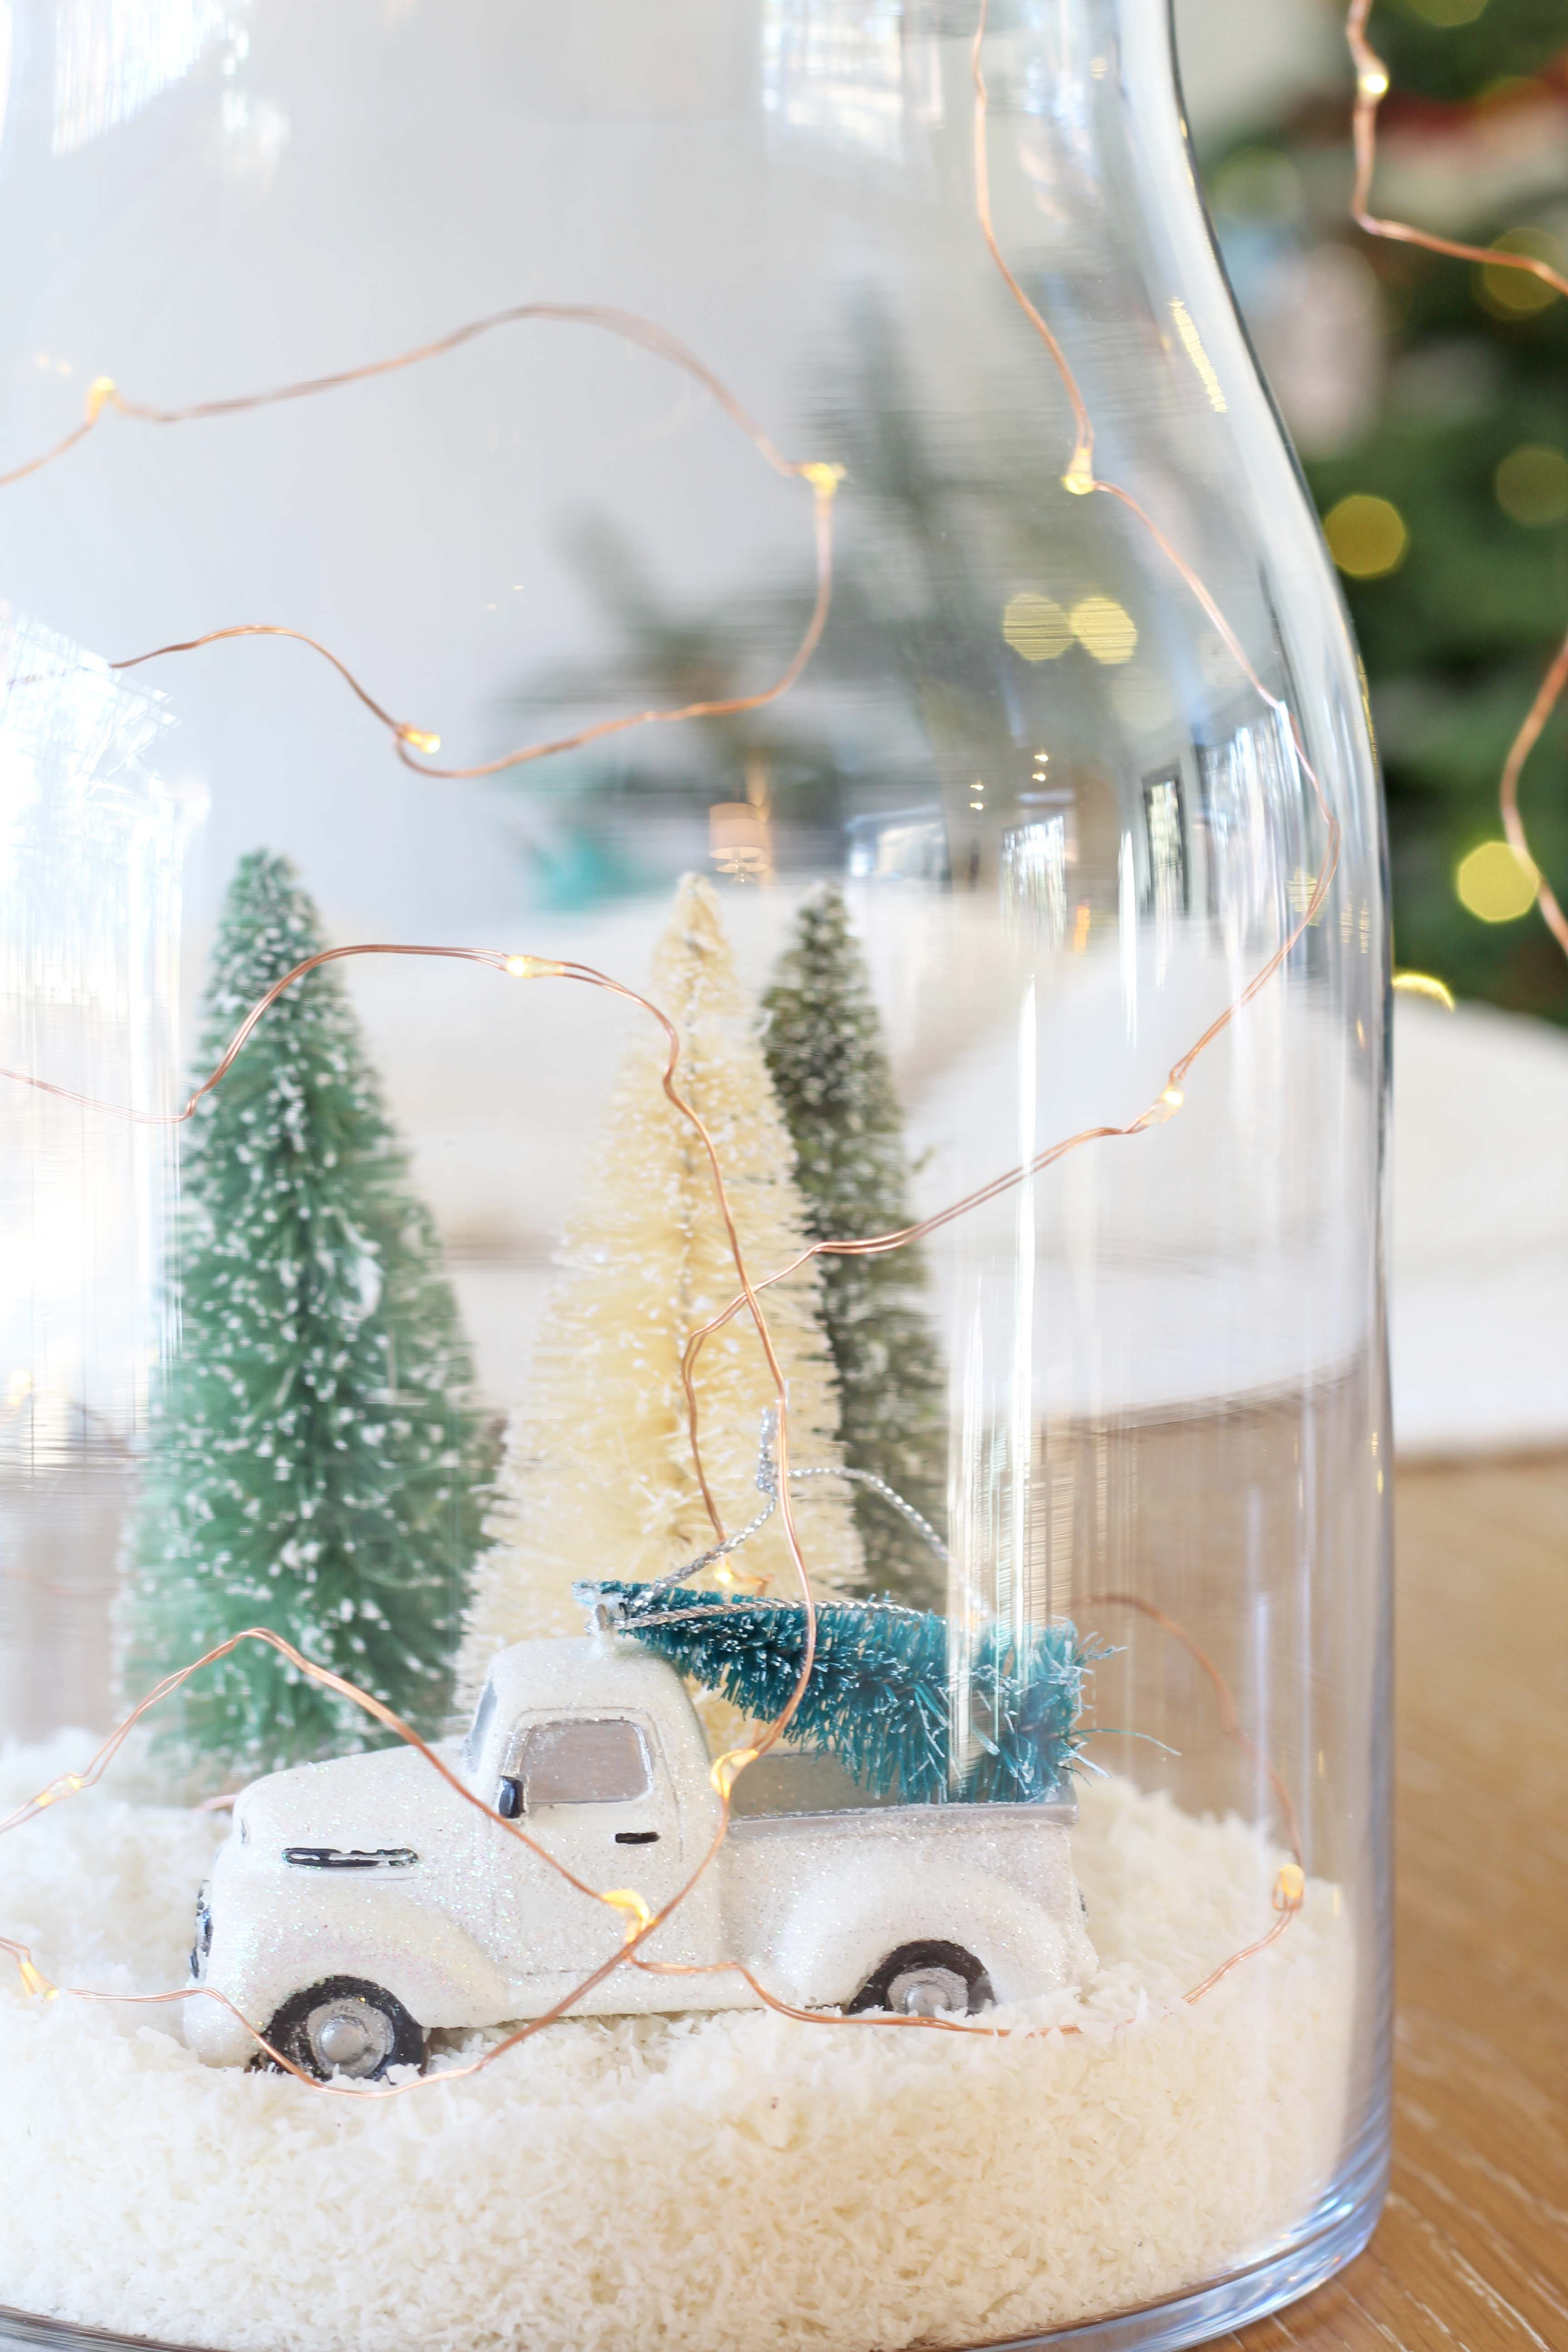 A Cozy Winter Snow Scene Jar With Images Diy Snow Globe